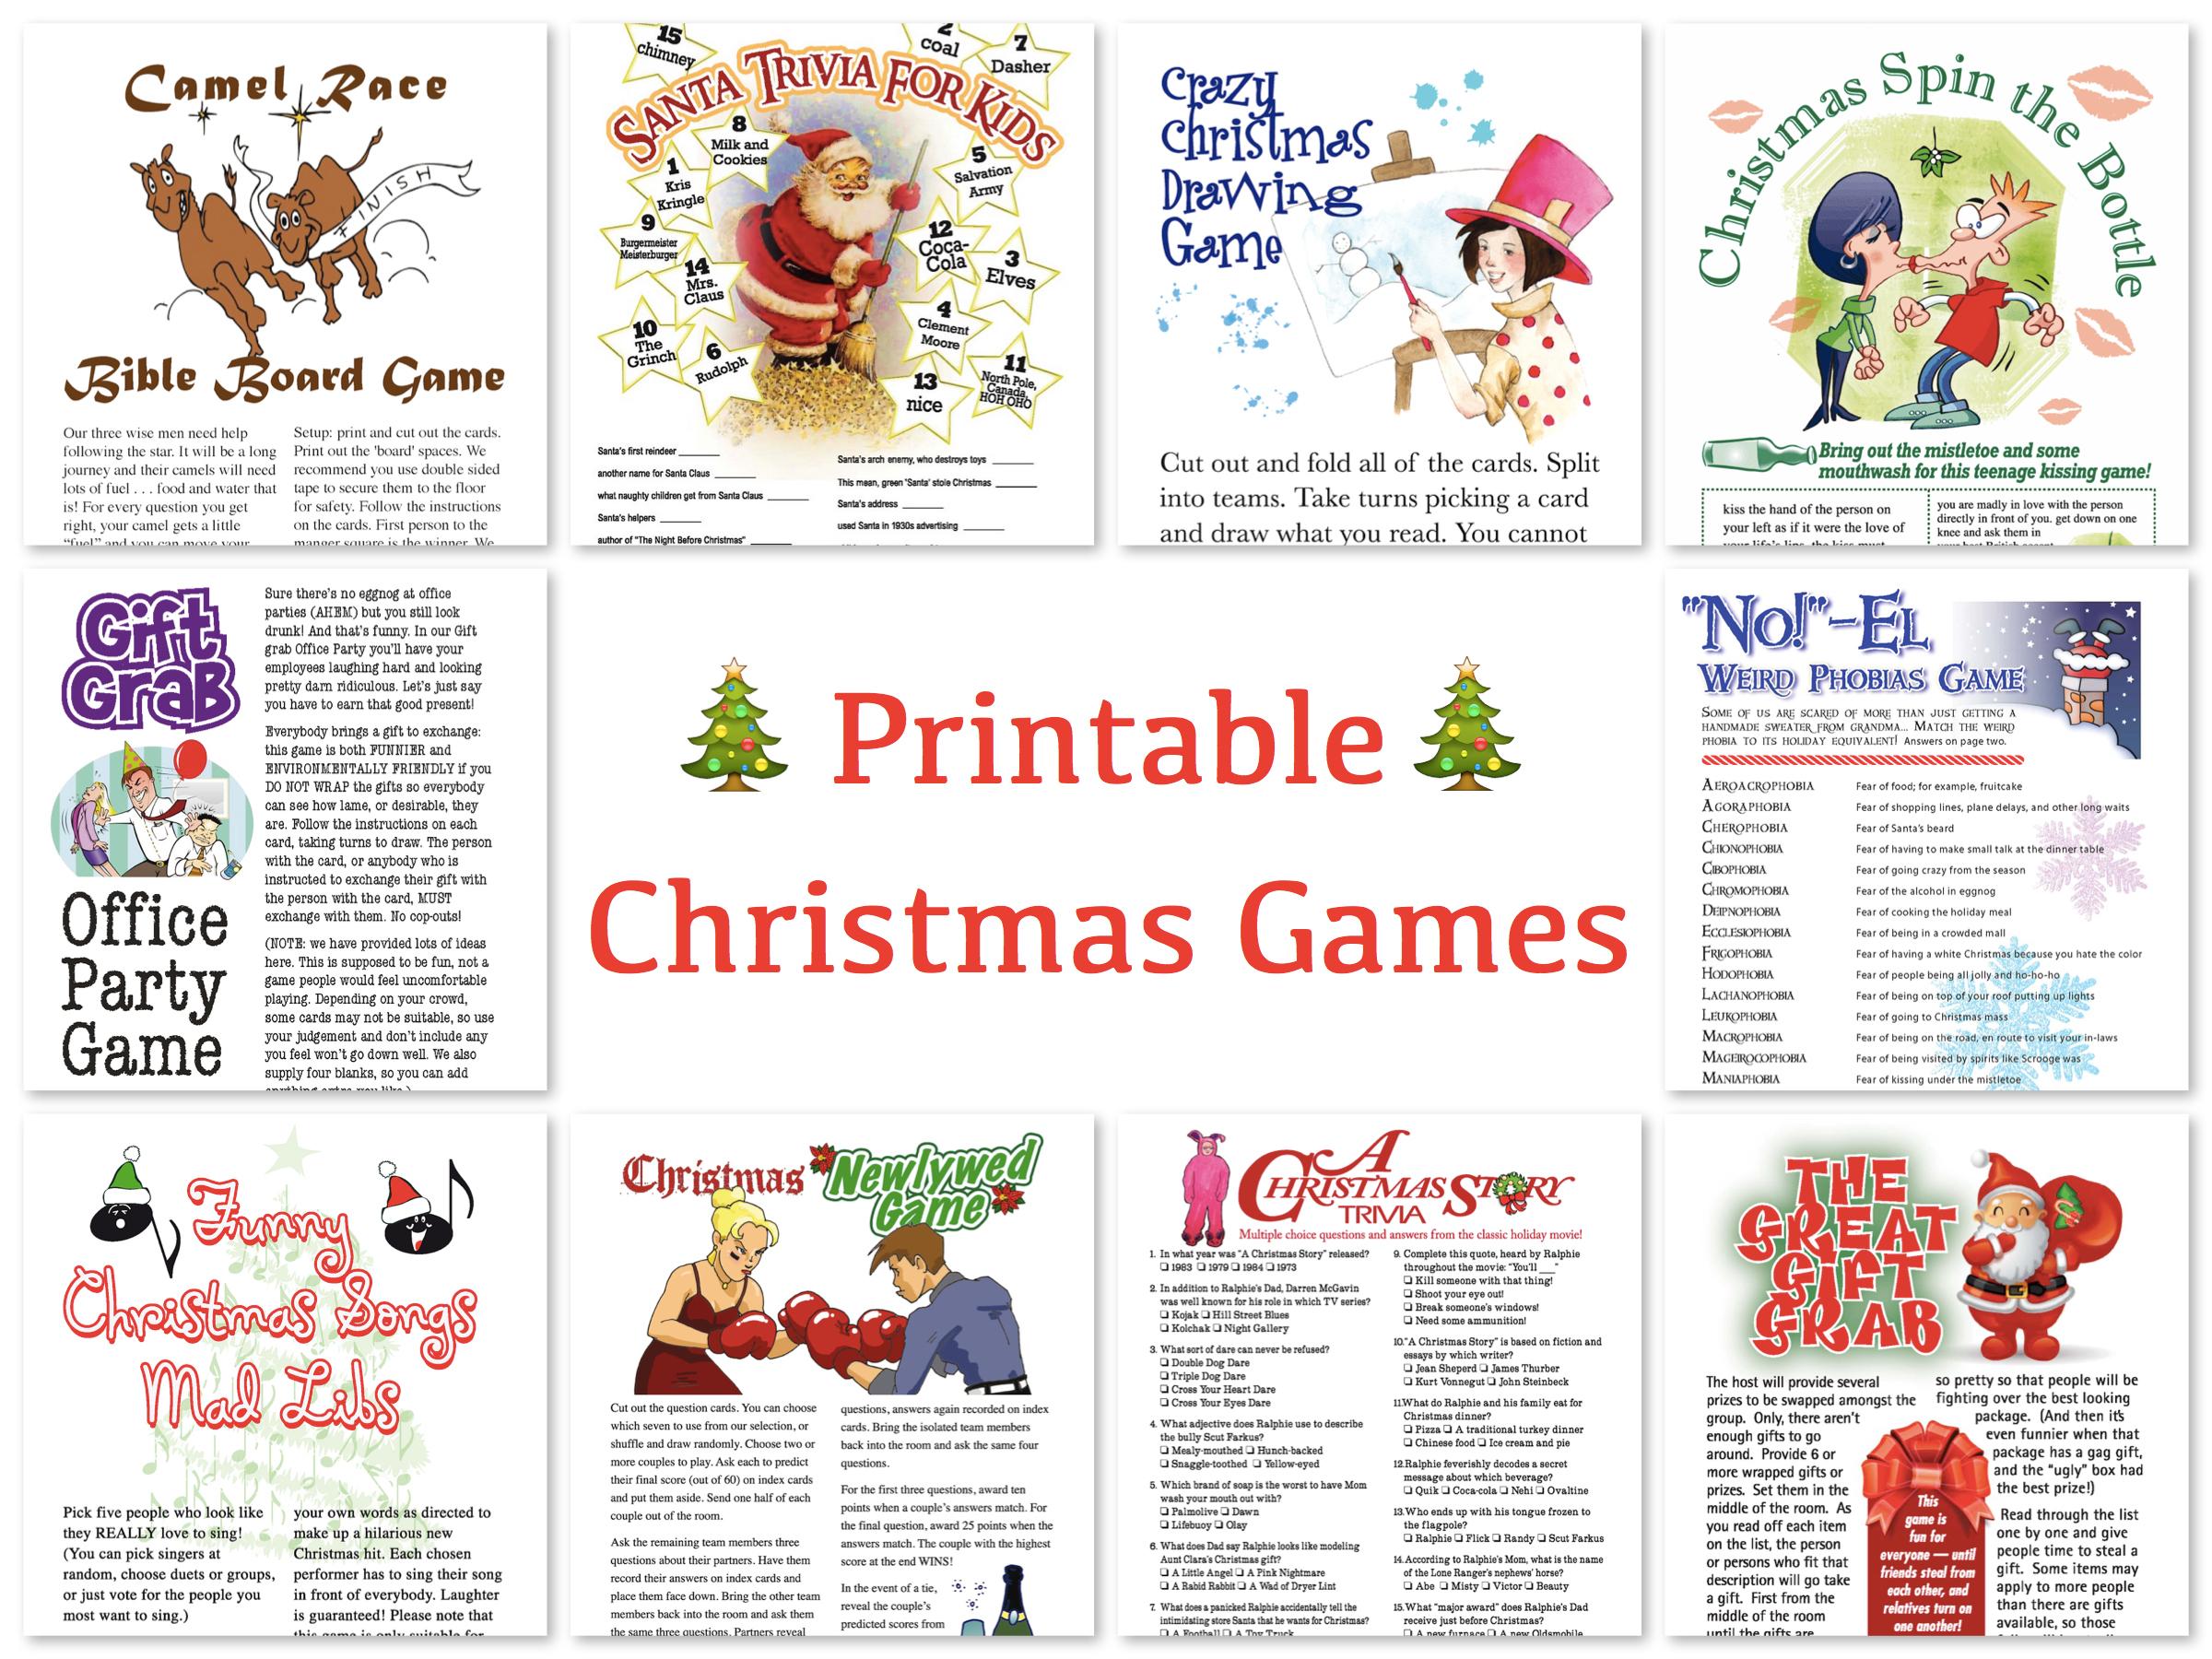 Printable Christmas Games For Family Gatherings – Festival Collections - Free Printable Christmas Games For Family Gatherings